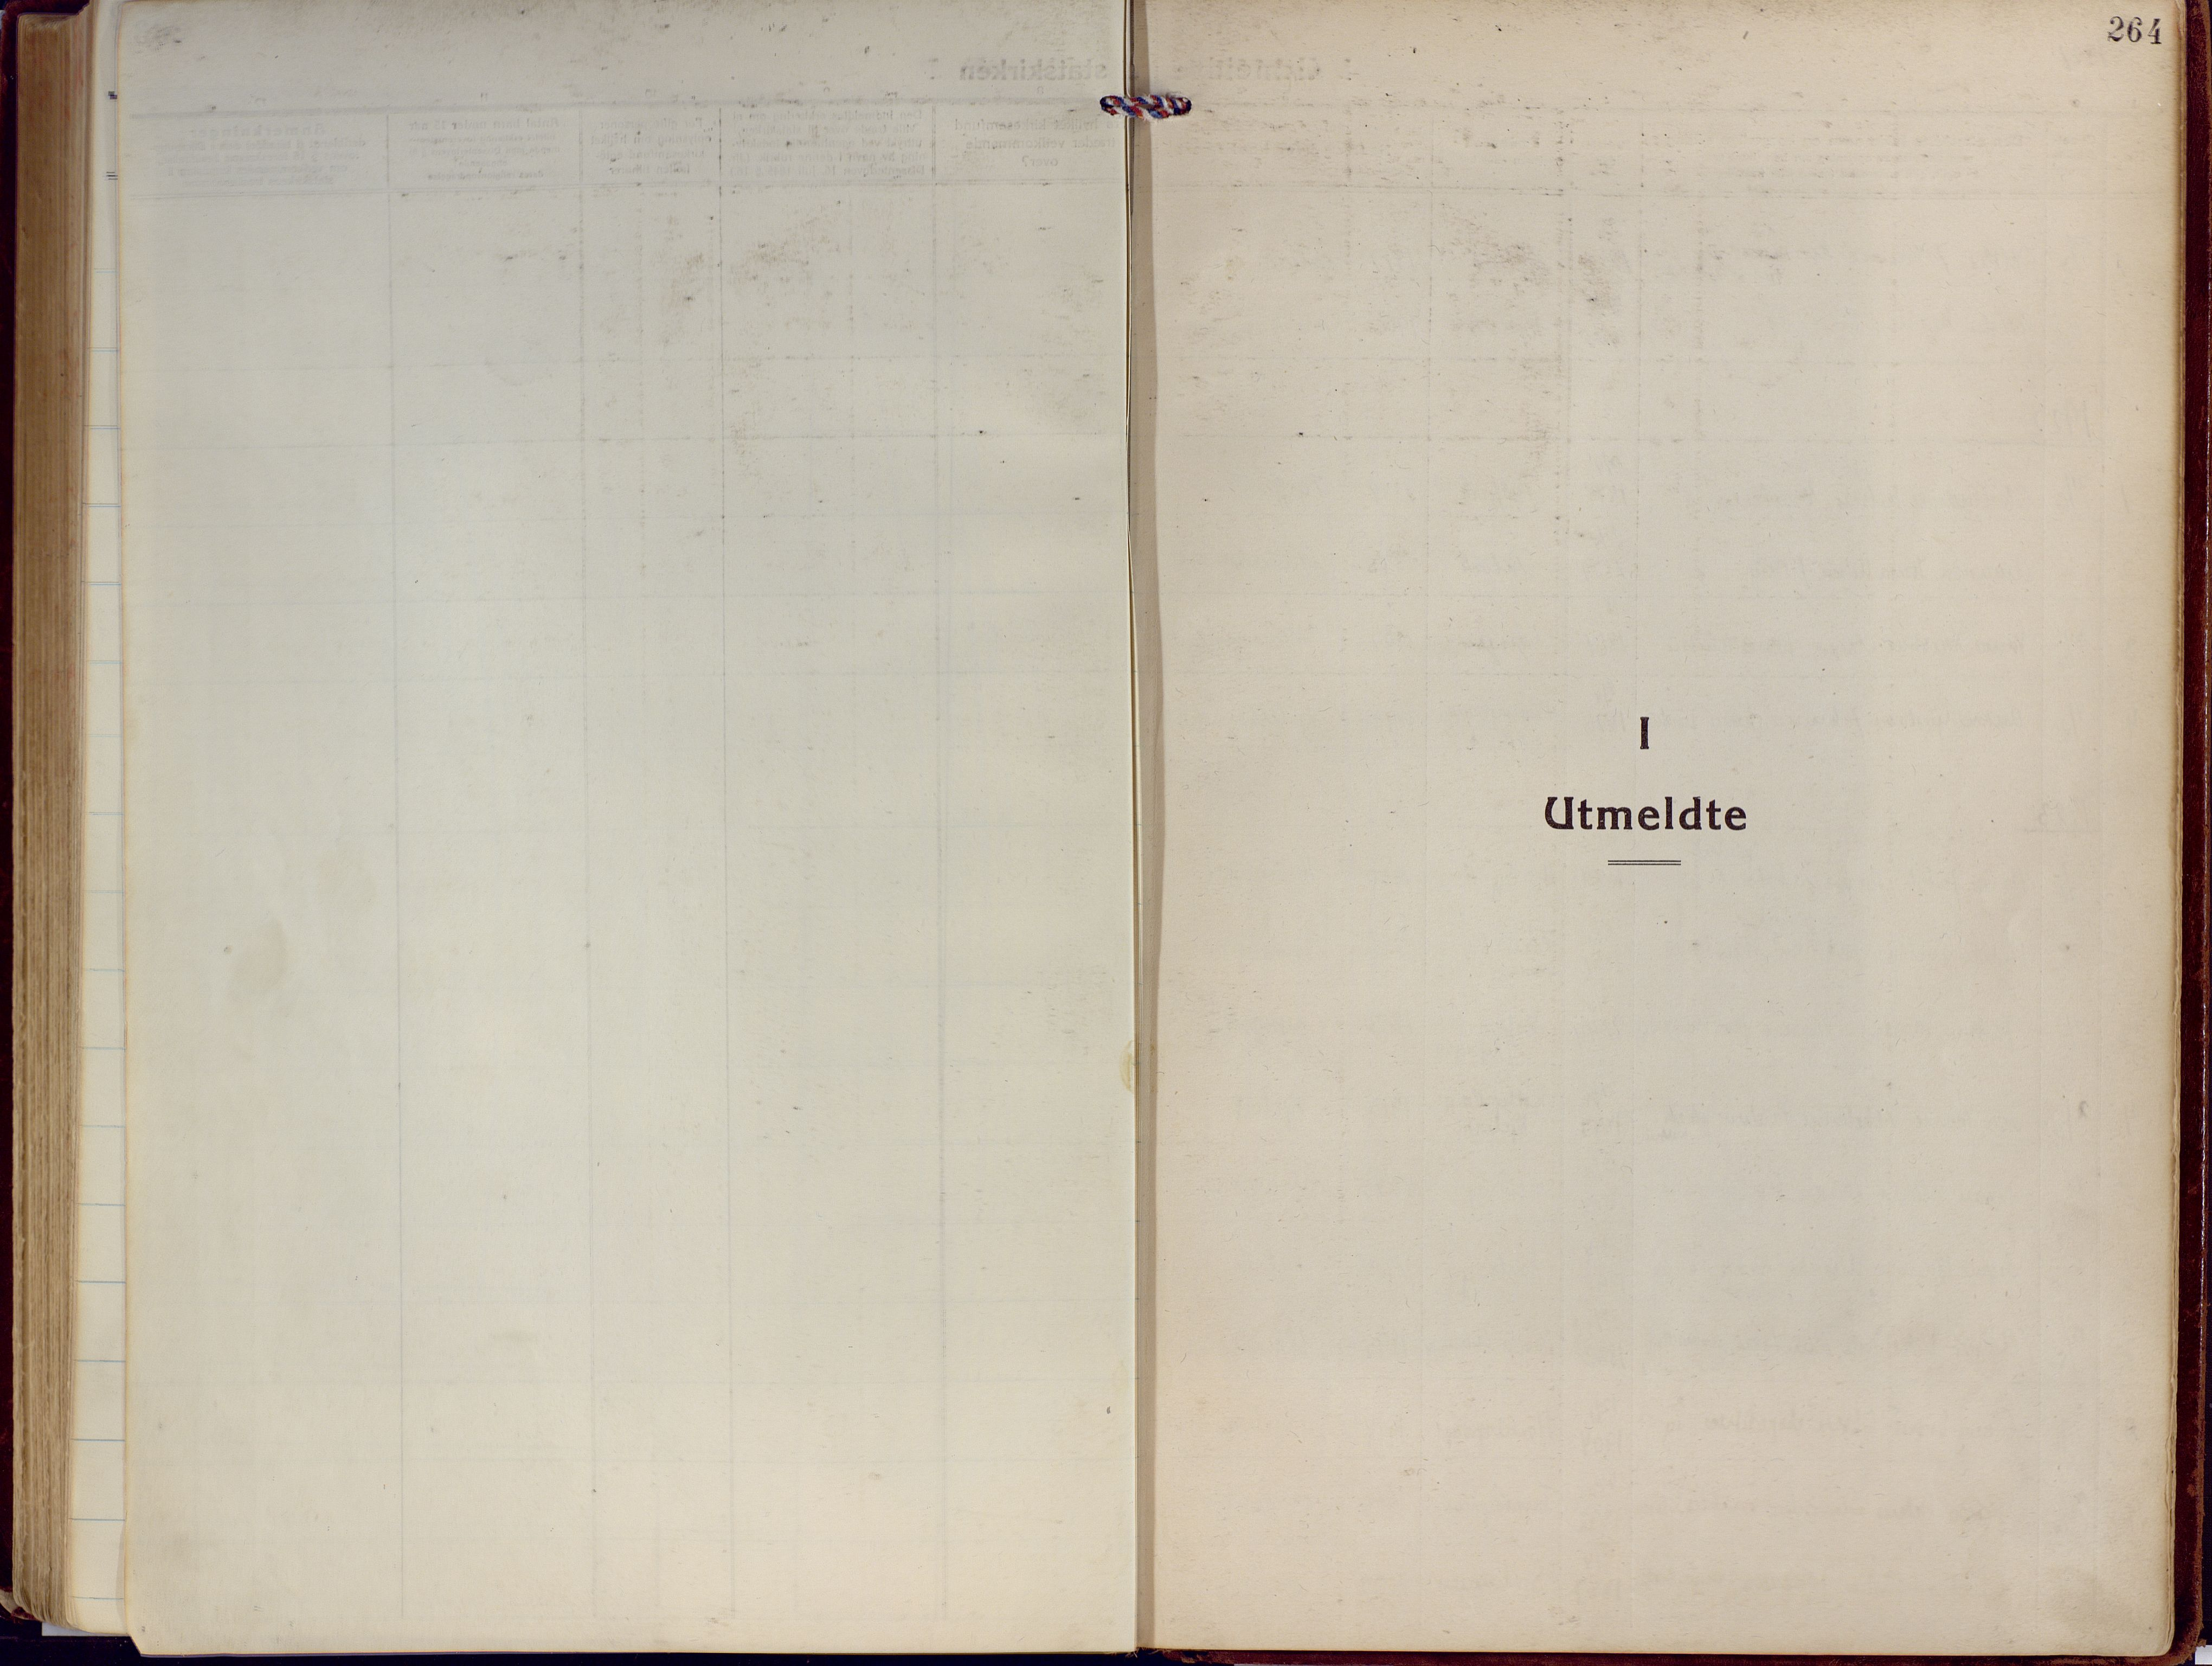 SATØ, Kjelvik/Nordkapp sokneprestkontor, H/Ha/L0002kirke: Ministerialbok nr. 2, 1920-1929, s. 264